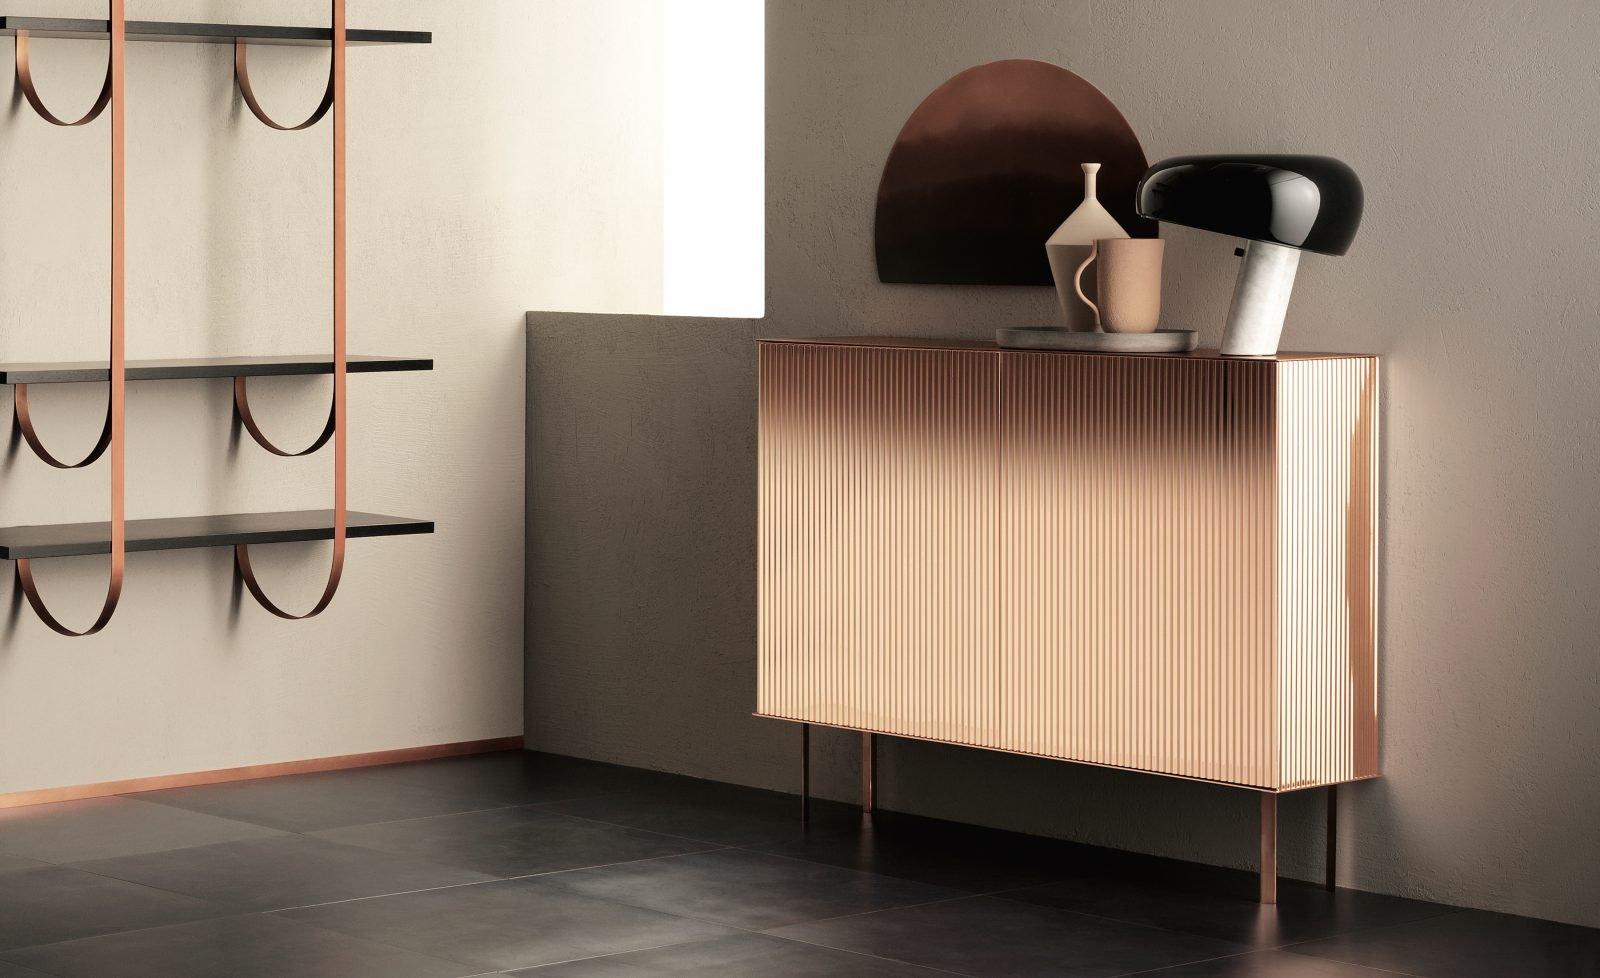 Elizabeth Cabinets from De Castelli, designed by Nathalie Dewez